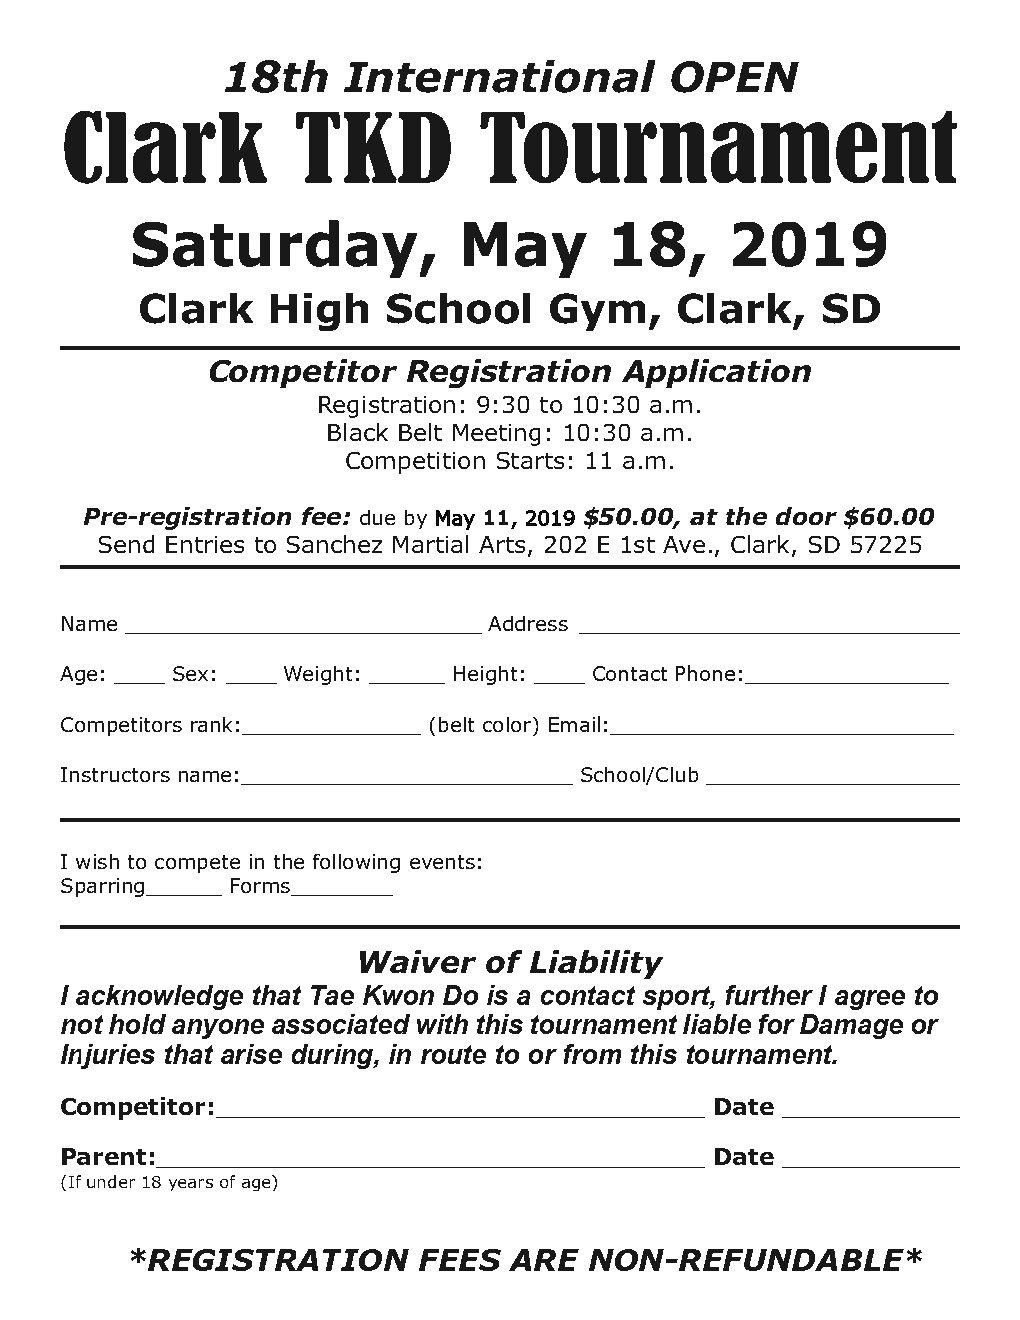 18th clark registration-2019